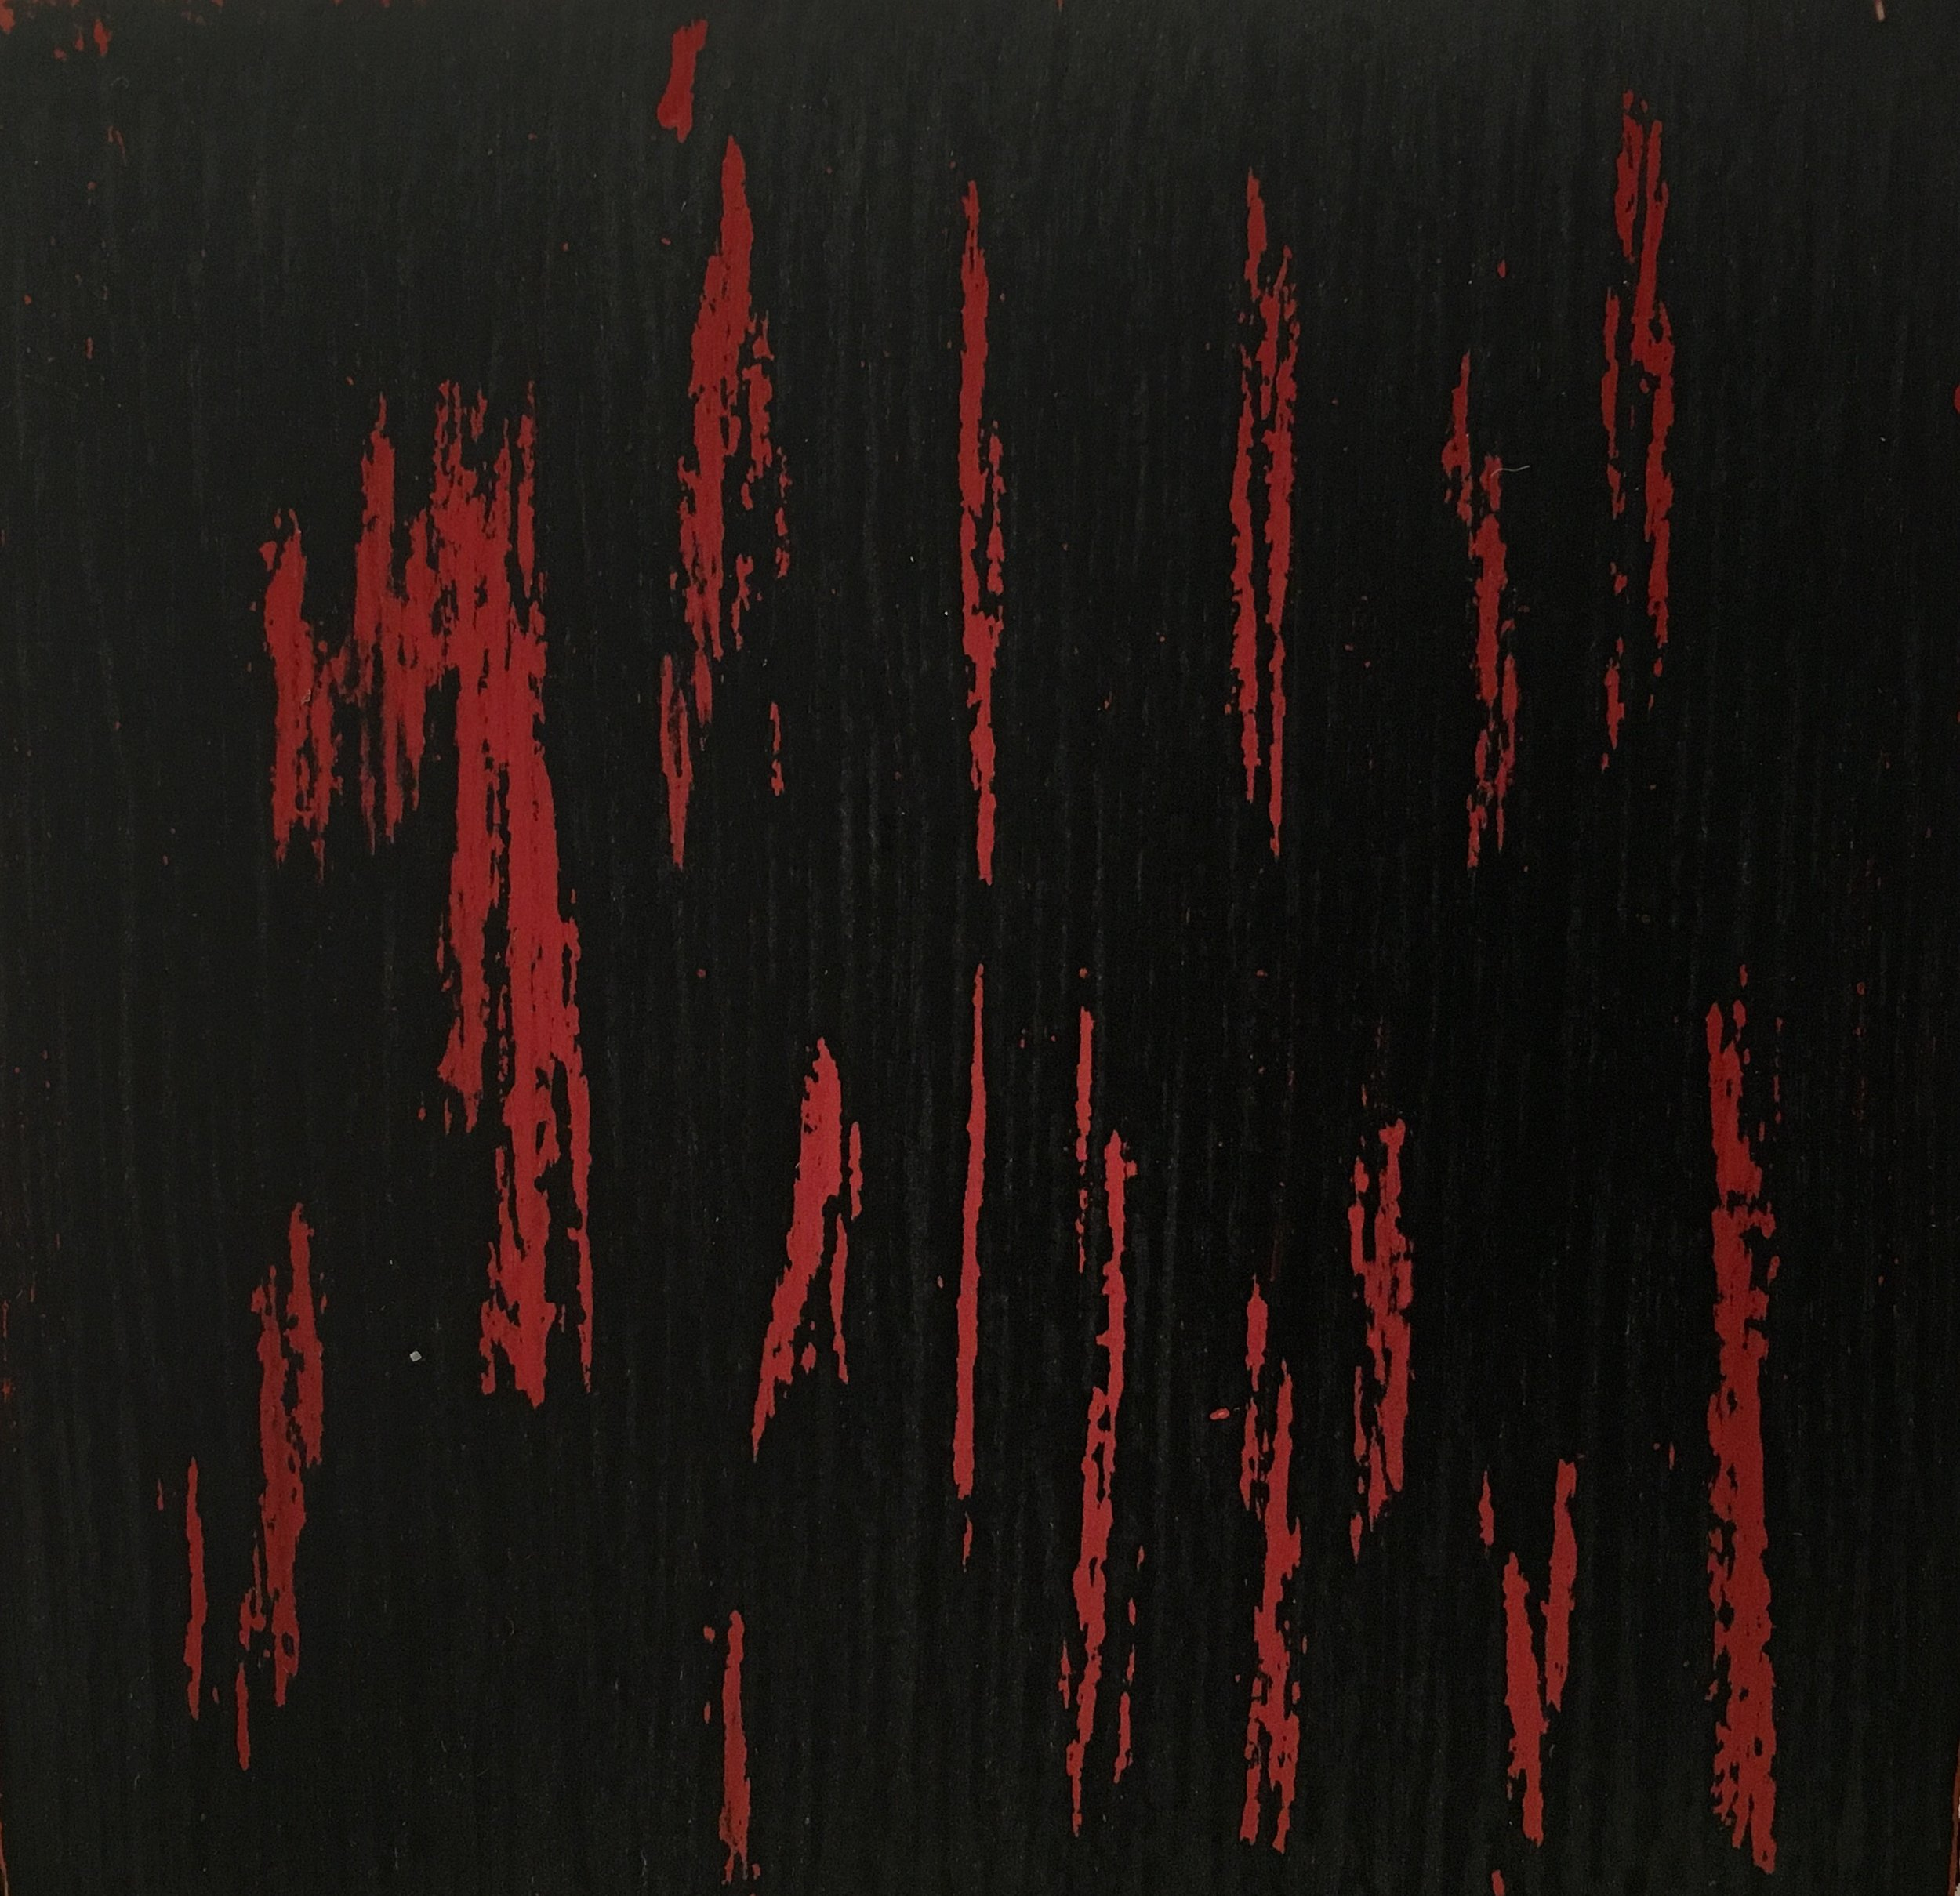 Onyx black over Crimson red